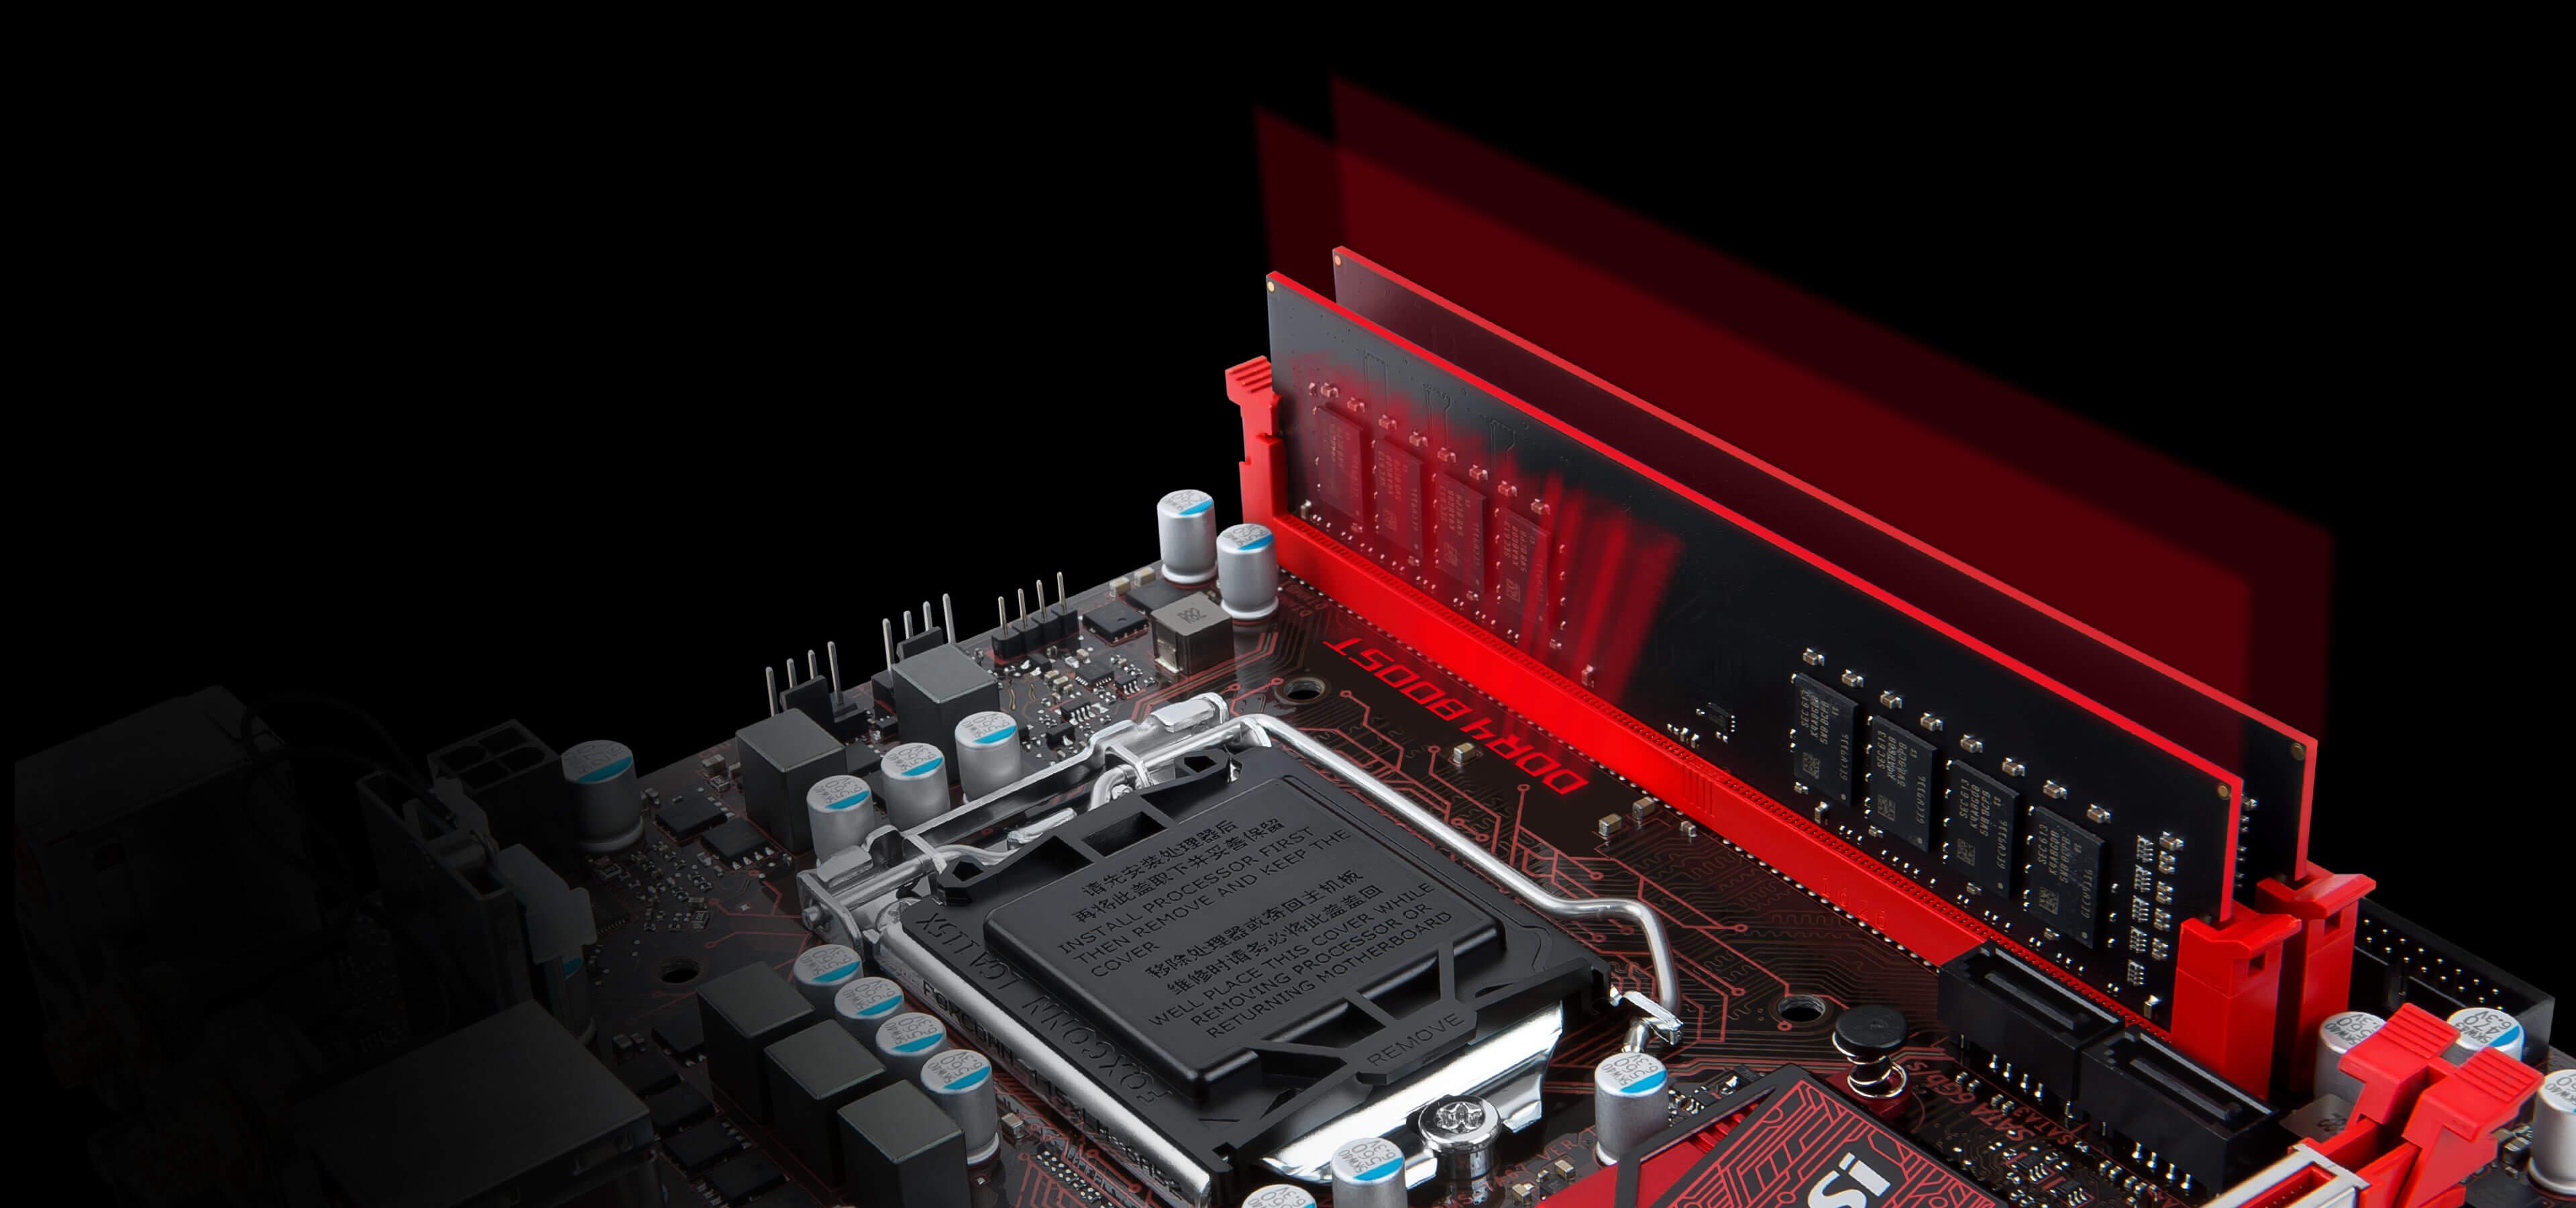 MSI B250I Gaming Pro AC LGA1151 Mini ITX Motherboard